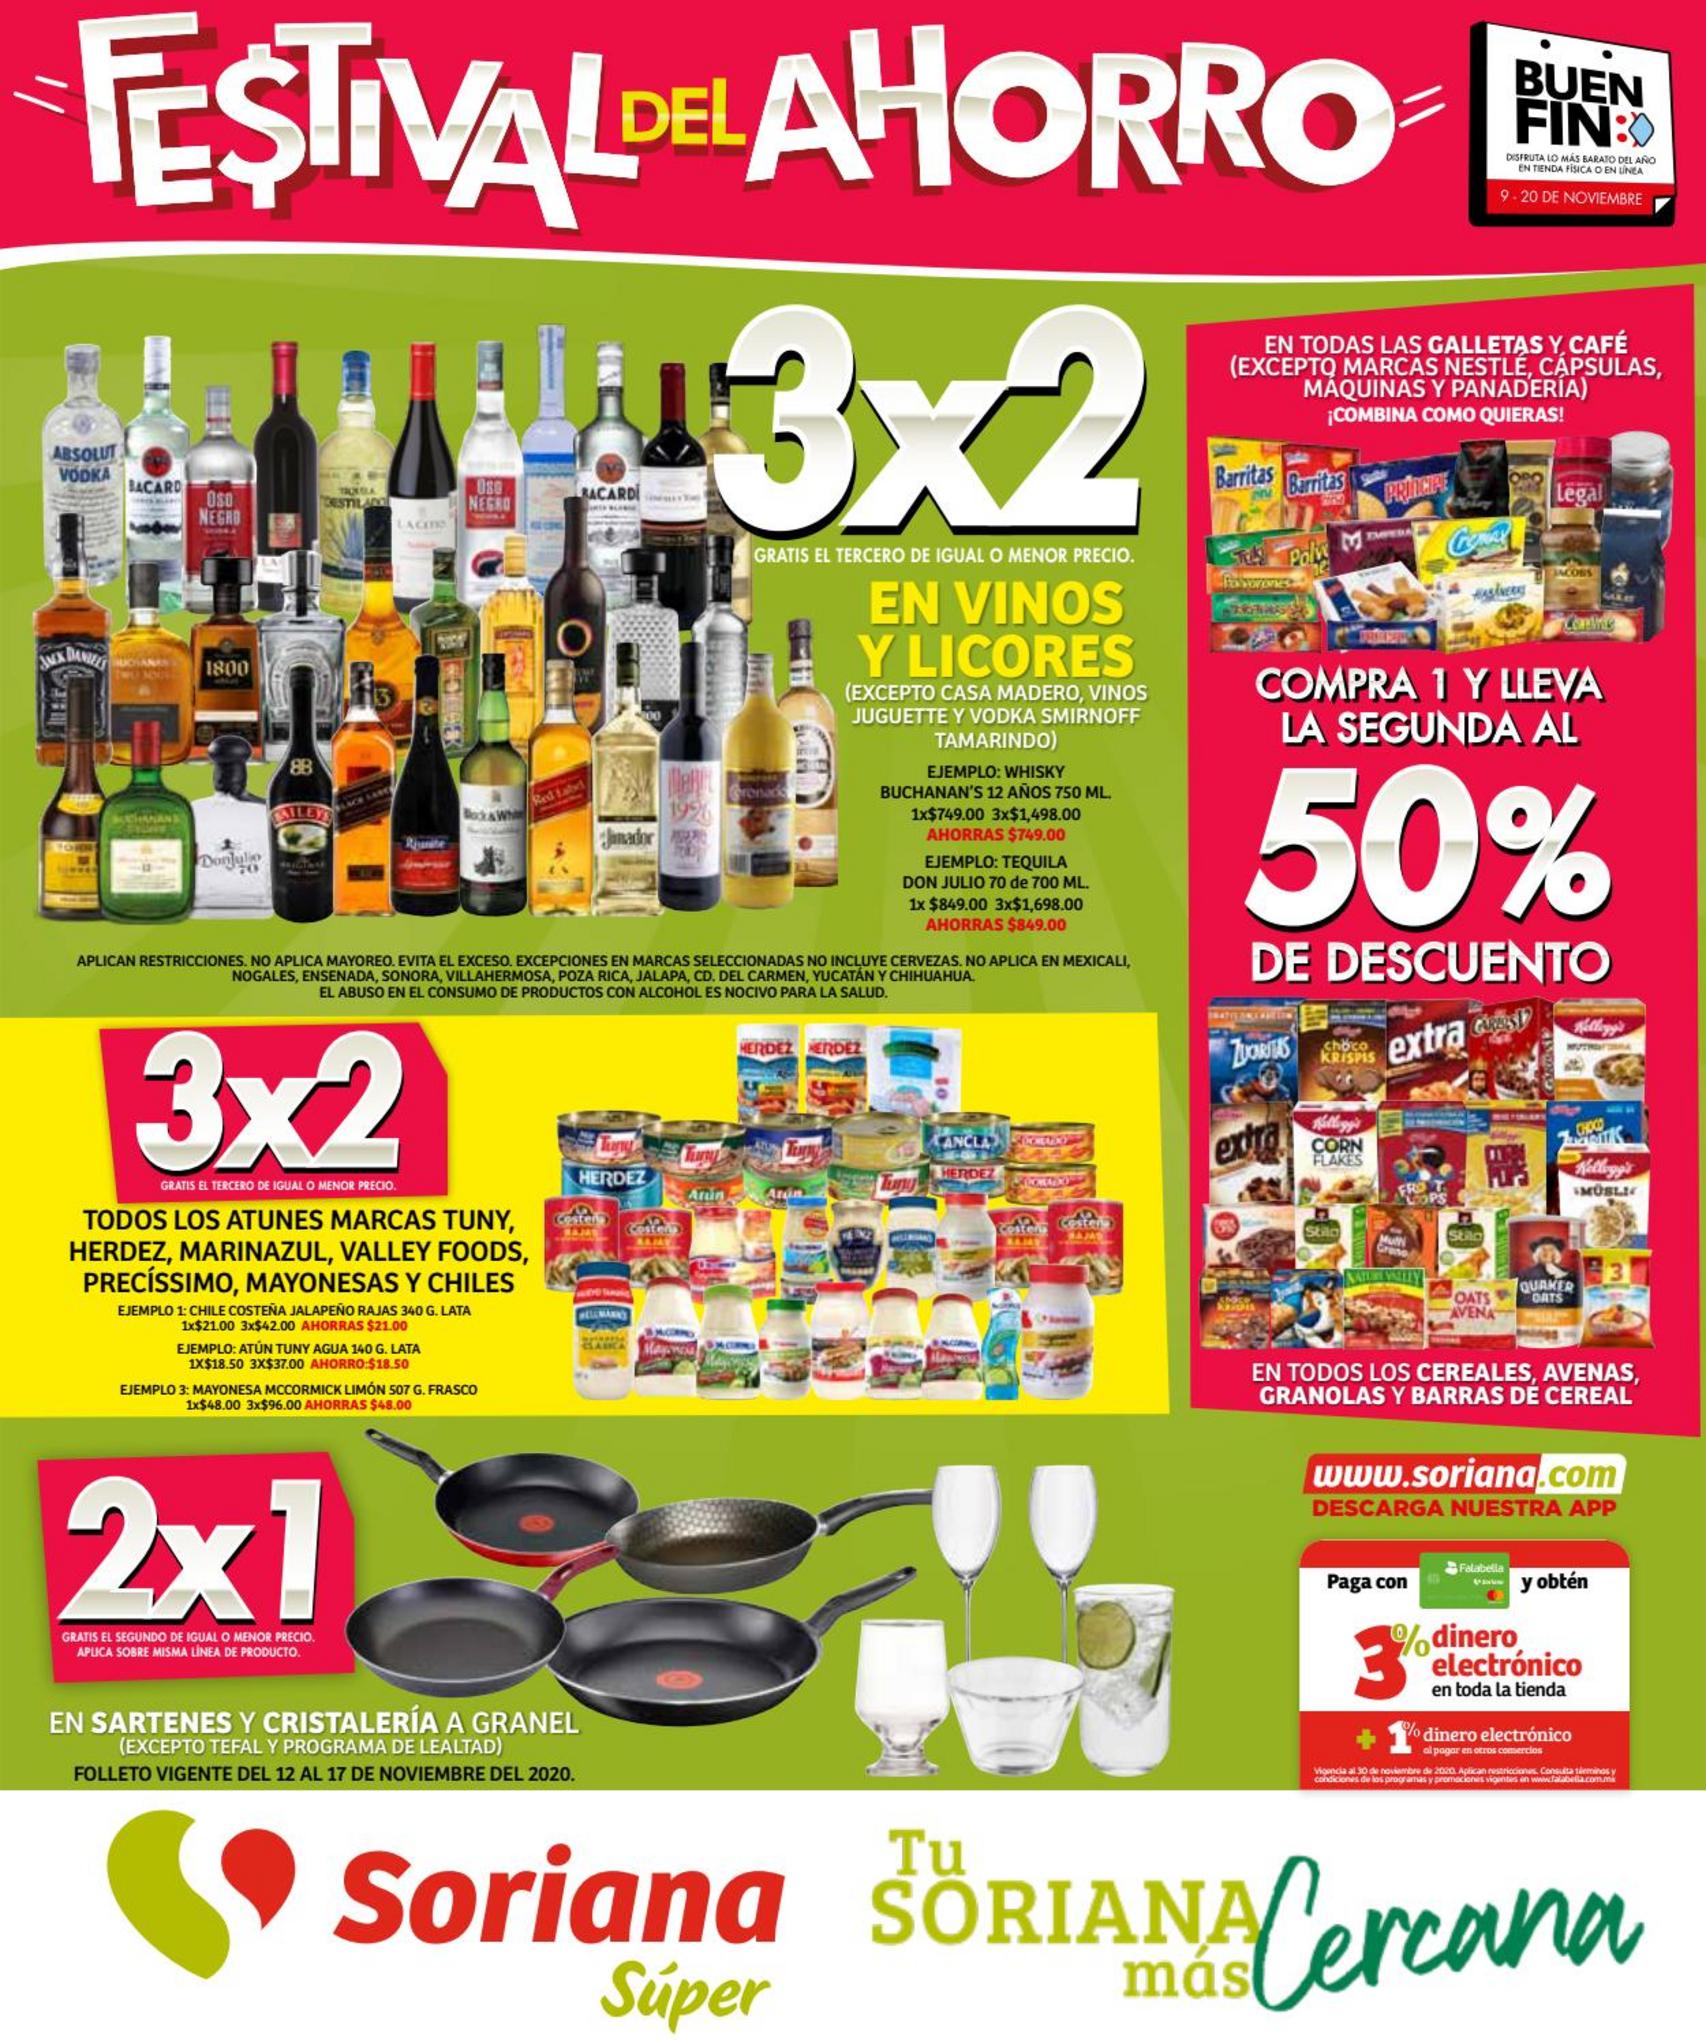 Folleto de ofertas Soriana Súper Buen Fin 2020 del 12 al 17 de noviembre